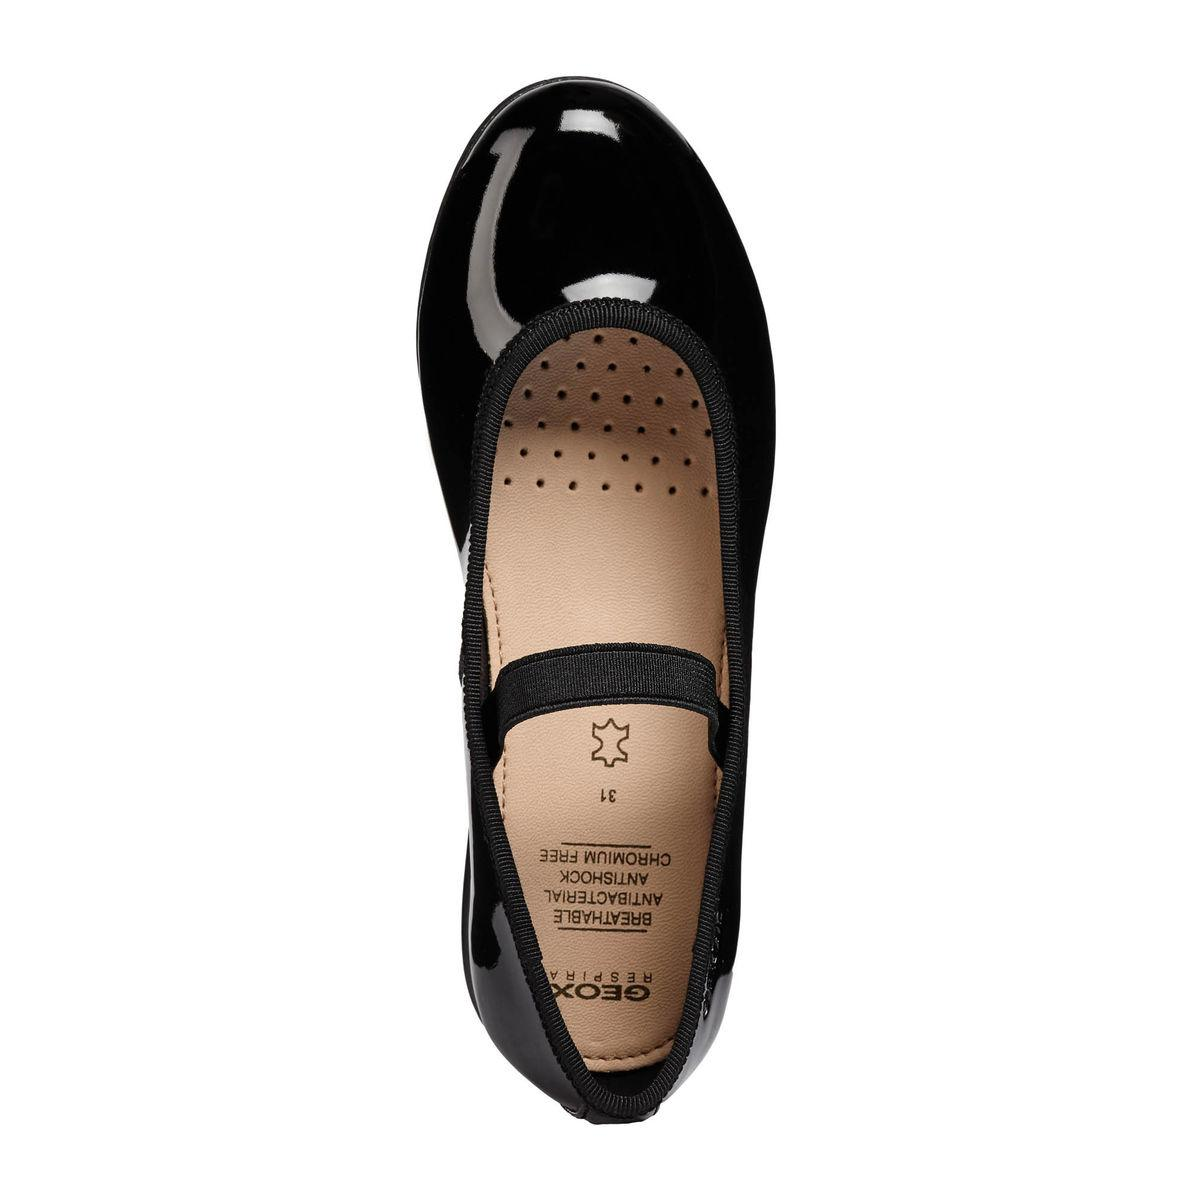 Bambina: scarpe Bambini 2 - 16 anni GEOX PLIE' BALLERINA JUNIOR GIRL IN VERNICE CON ELASTICO J8455D